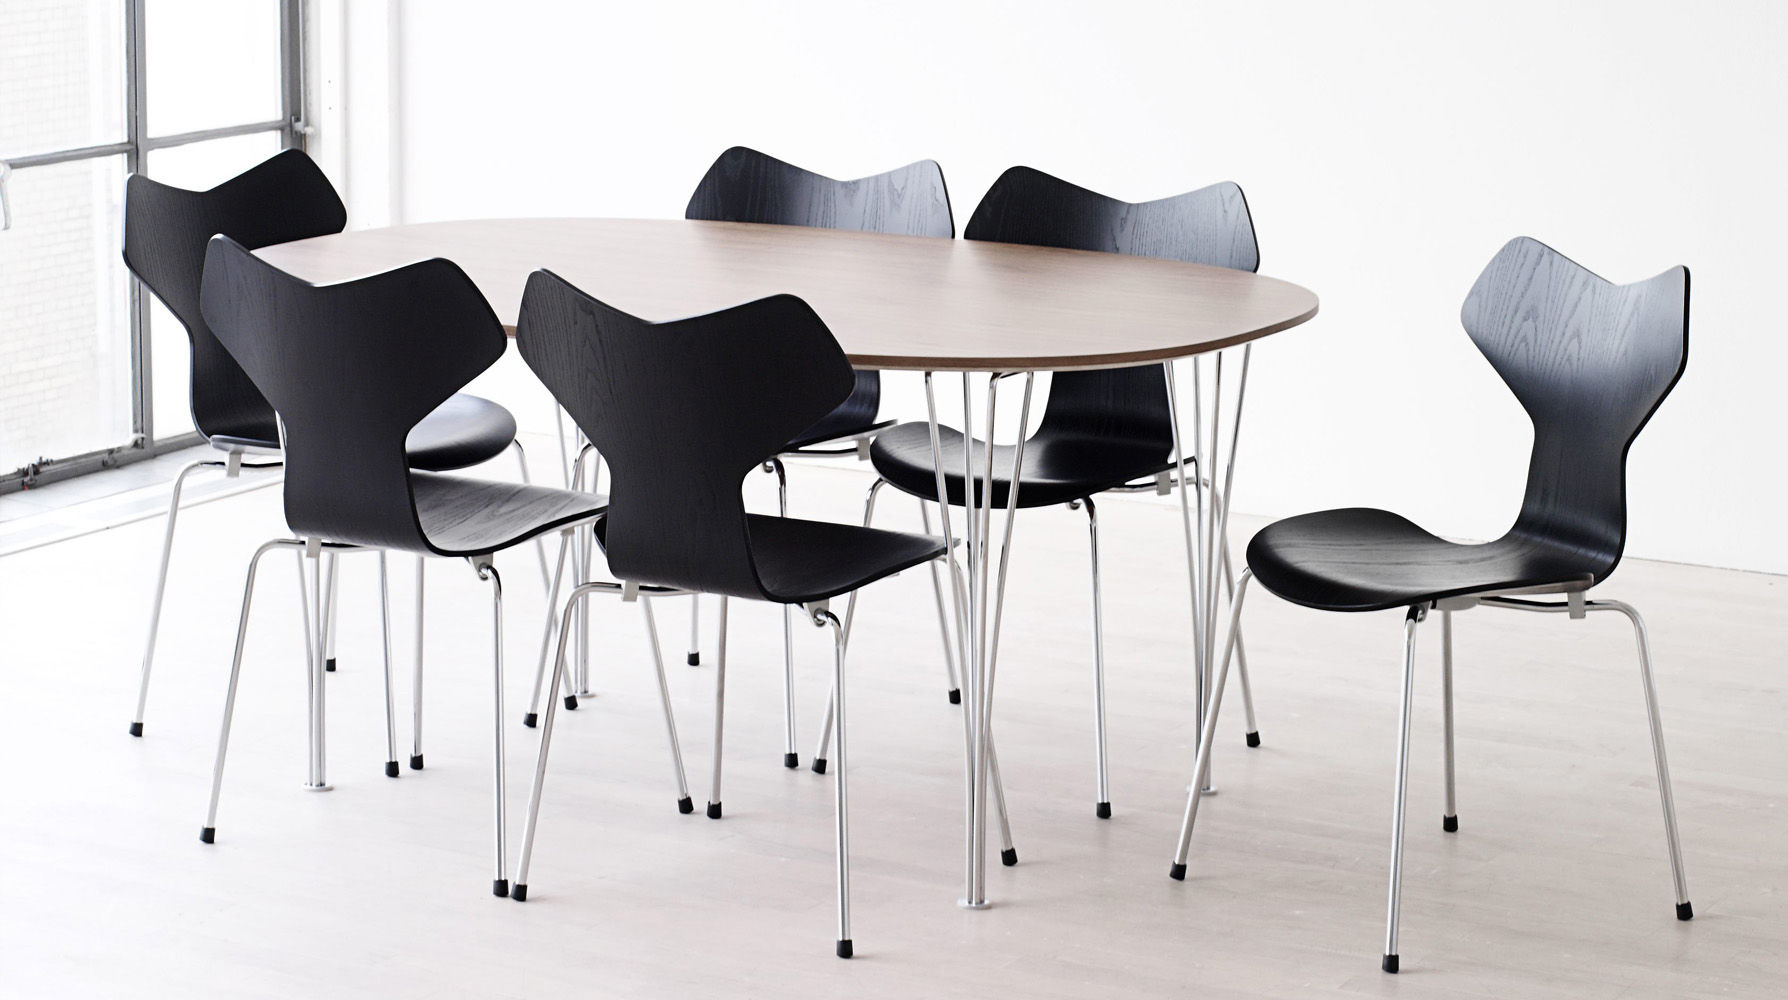 Chaise empilable grand prix bois blanc fritz hansen for Prix chaise bois